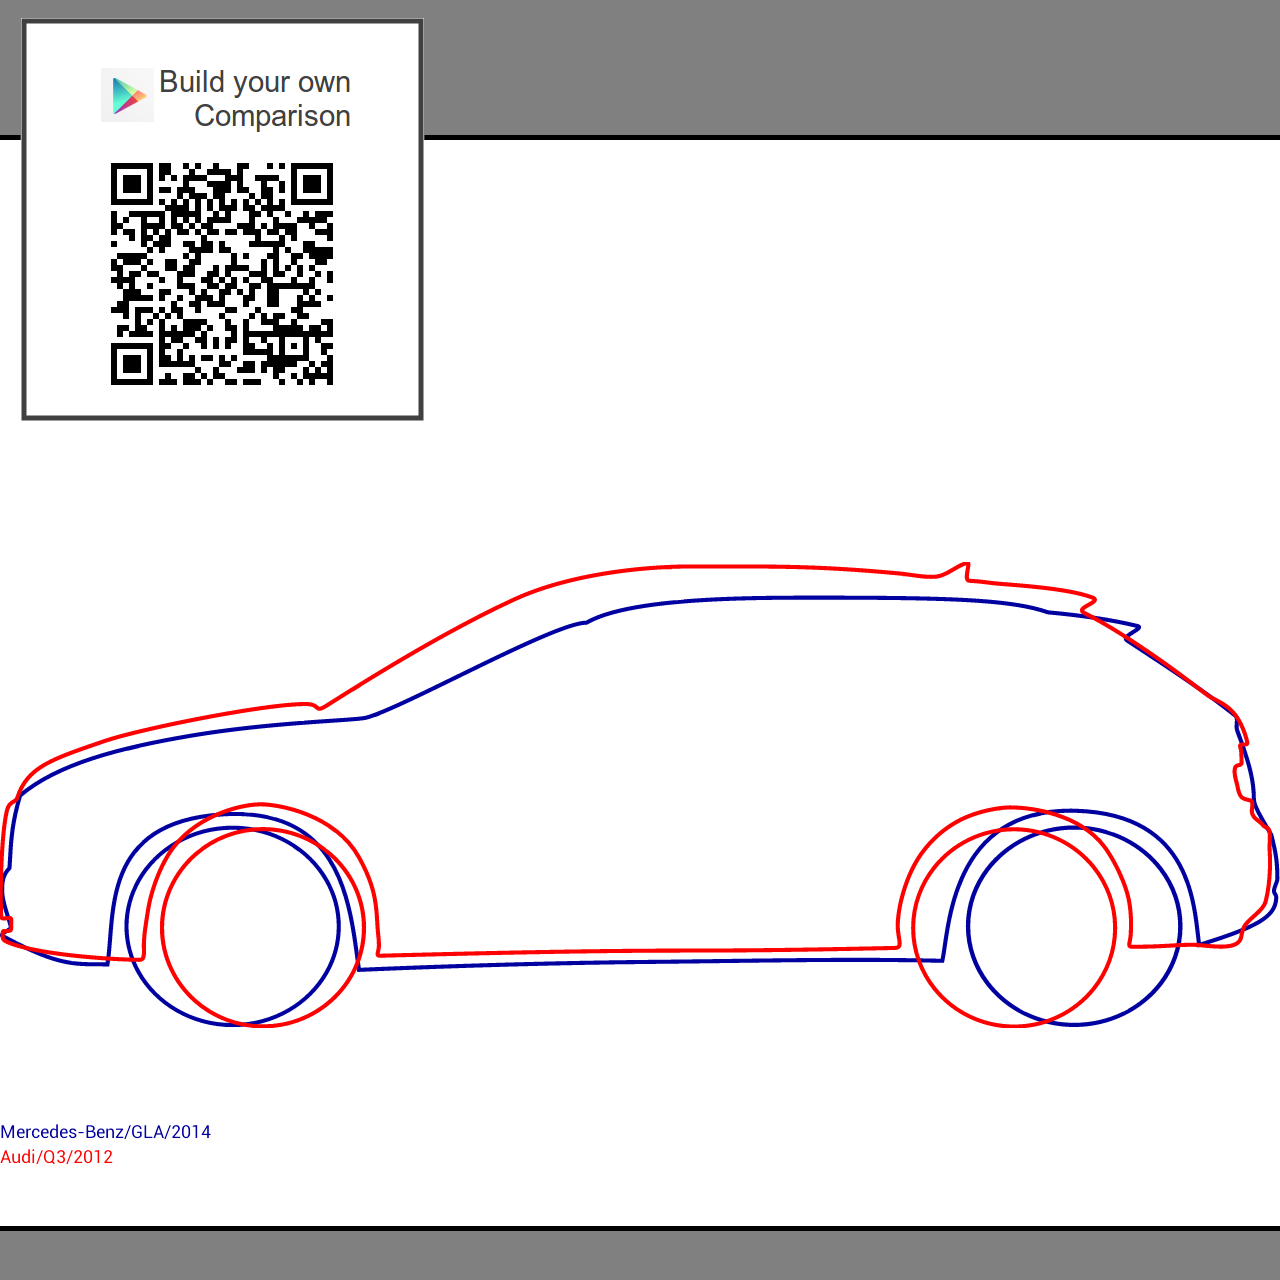 Audi Q3 Vs Mercedes GLA: Dimensions